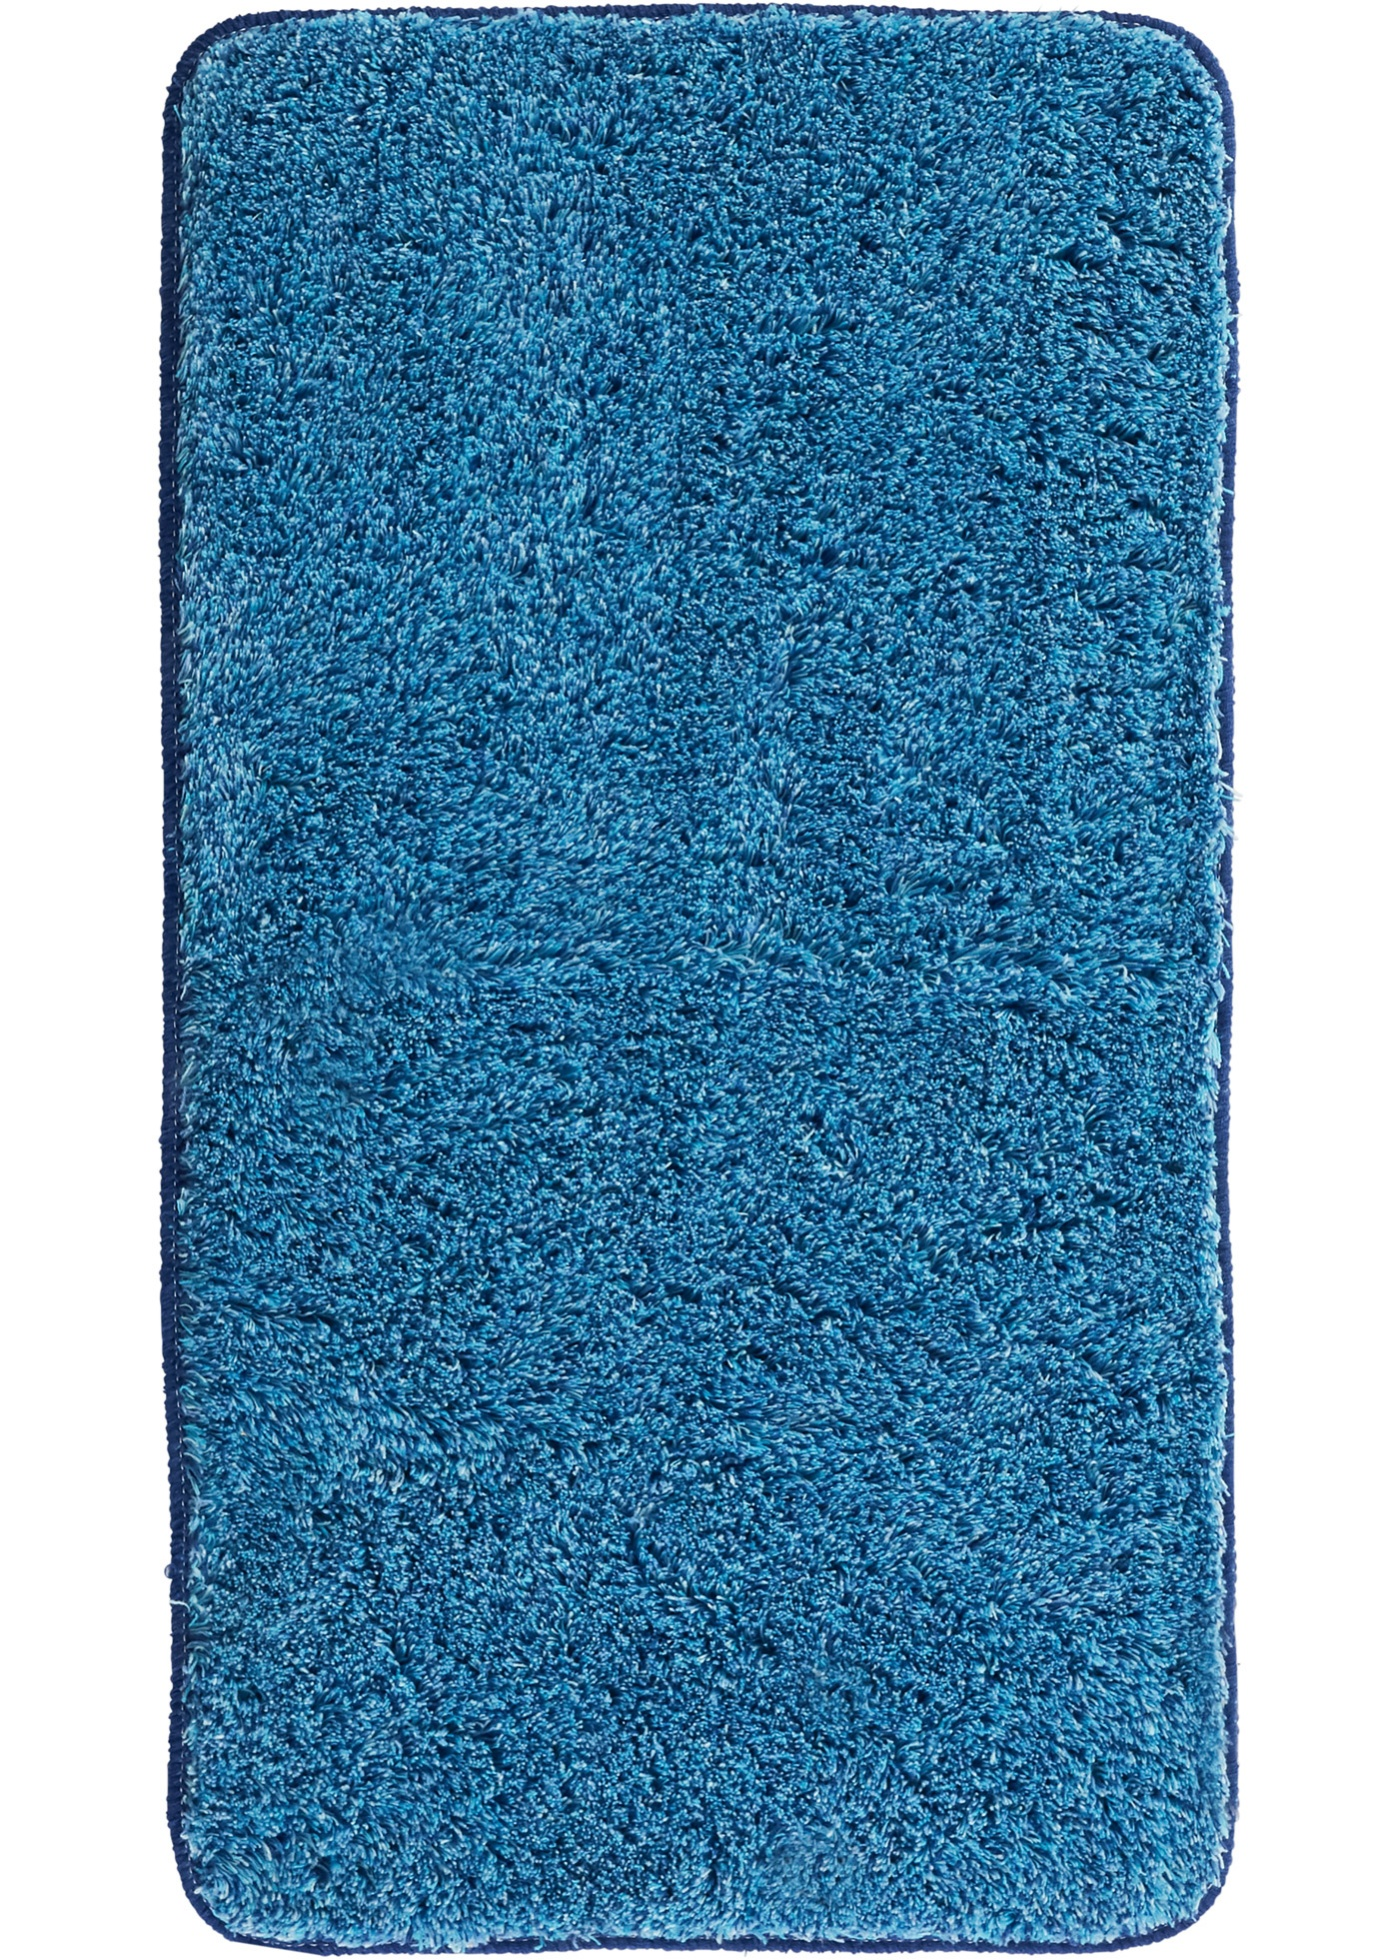 Tappeti 1 confronta i prezzi per tappetino da bagno frida - Bonprix tappeti bagno ...